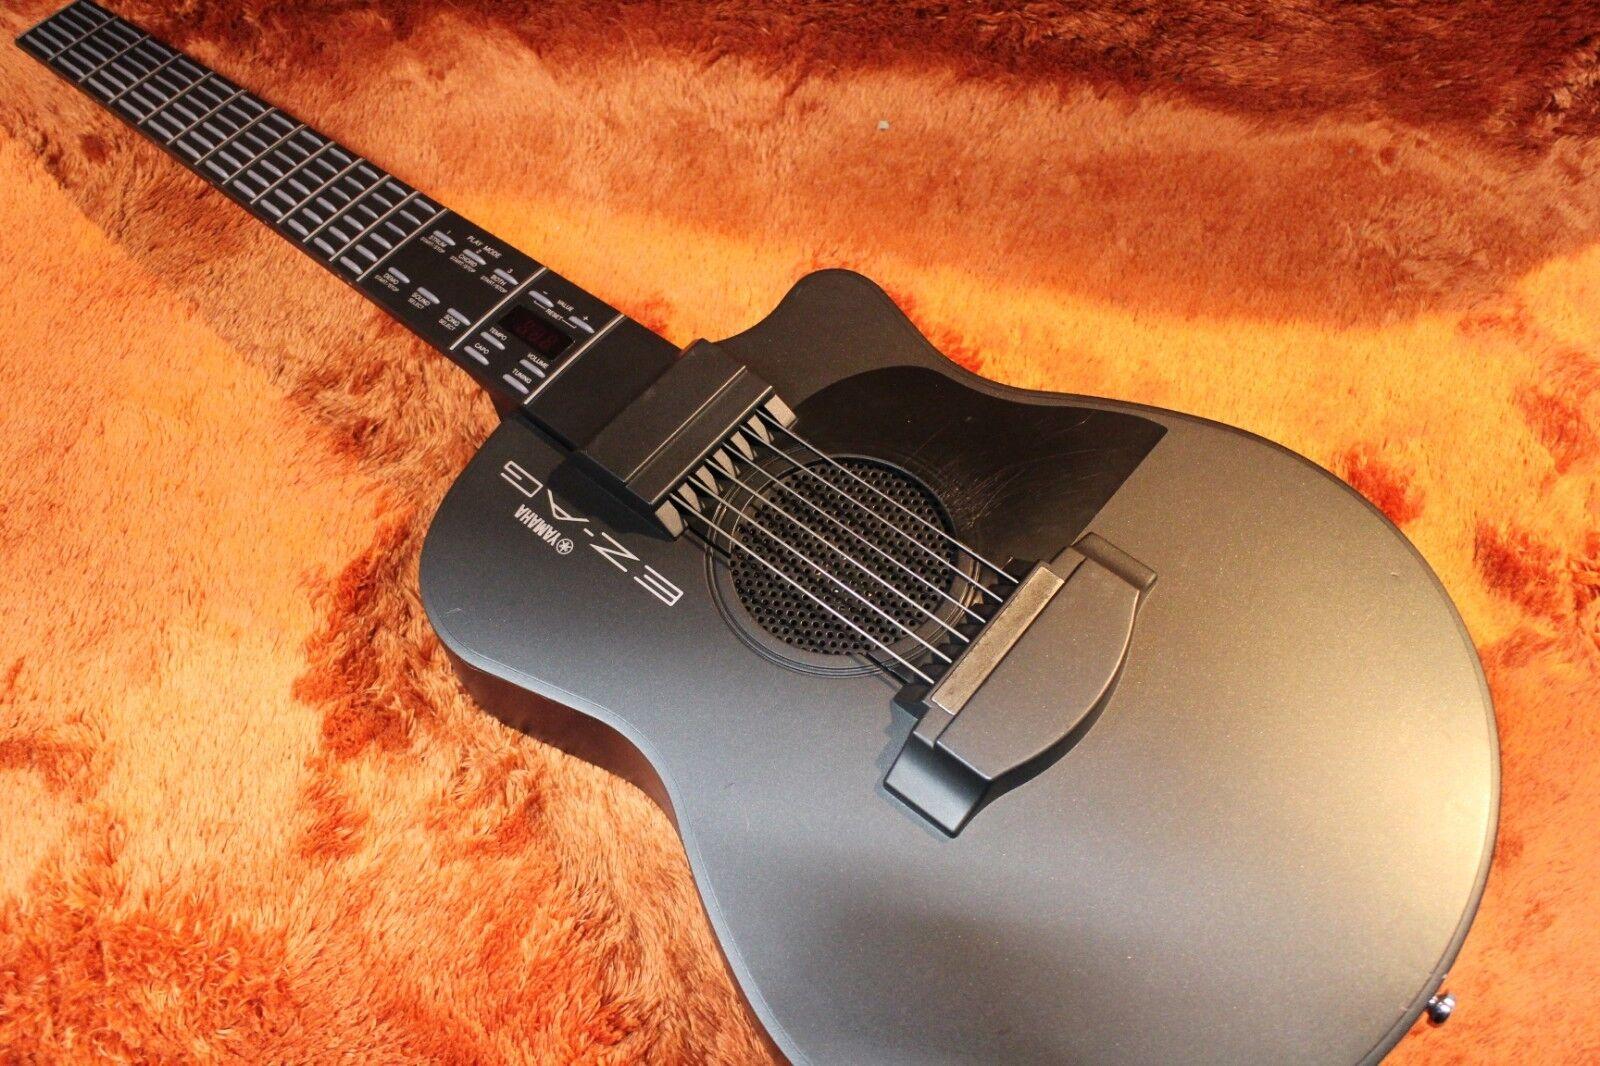 Used Yamaha EZ-AG Digital Acoustic Guitar from Japan EZ AG U442 190201